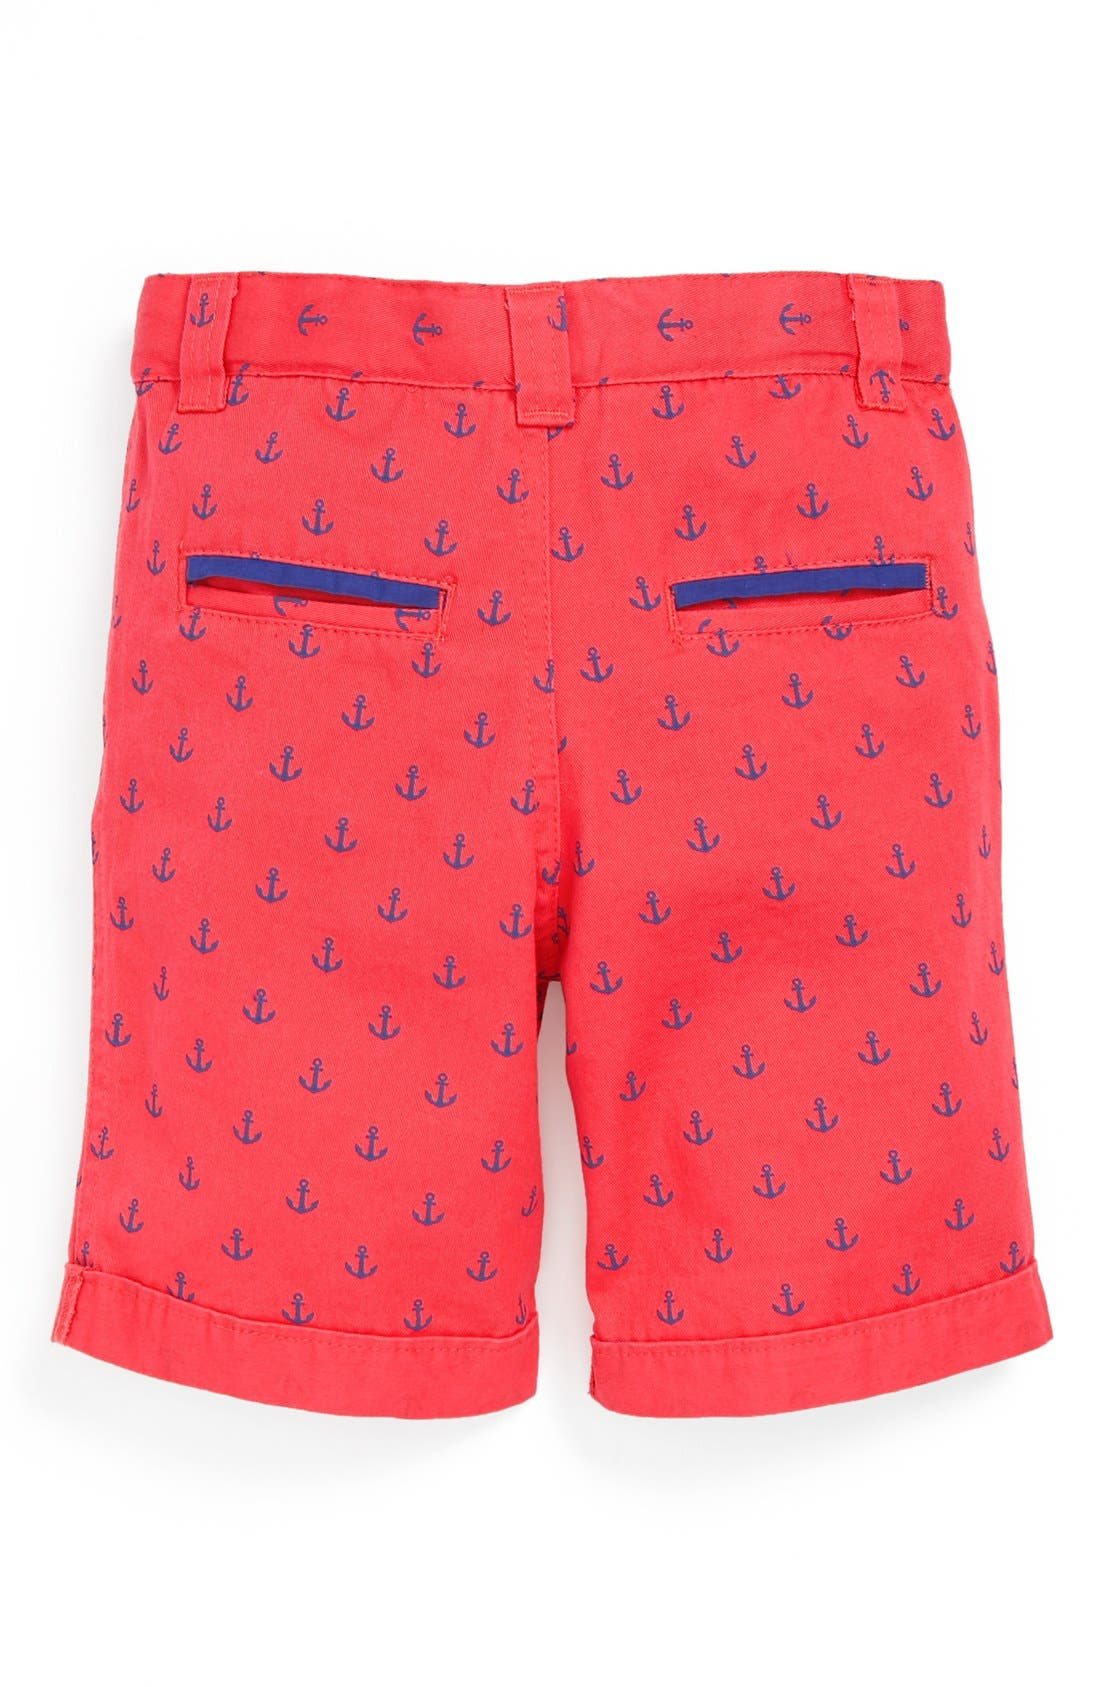 Alternate Image 2  - Sovereign Code Anchor Print Shorts (Toddler Boys)